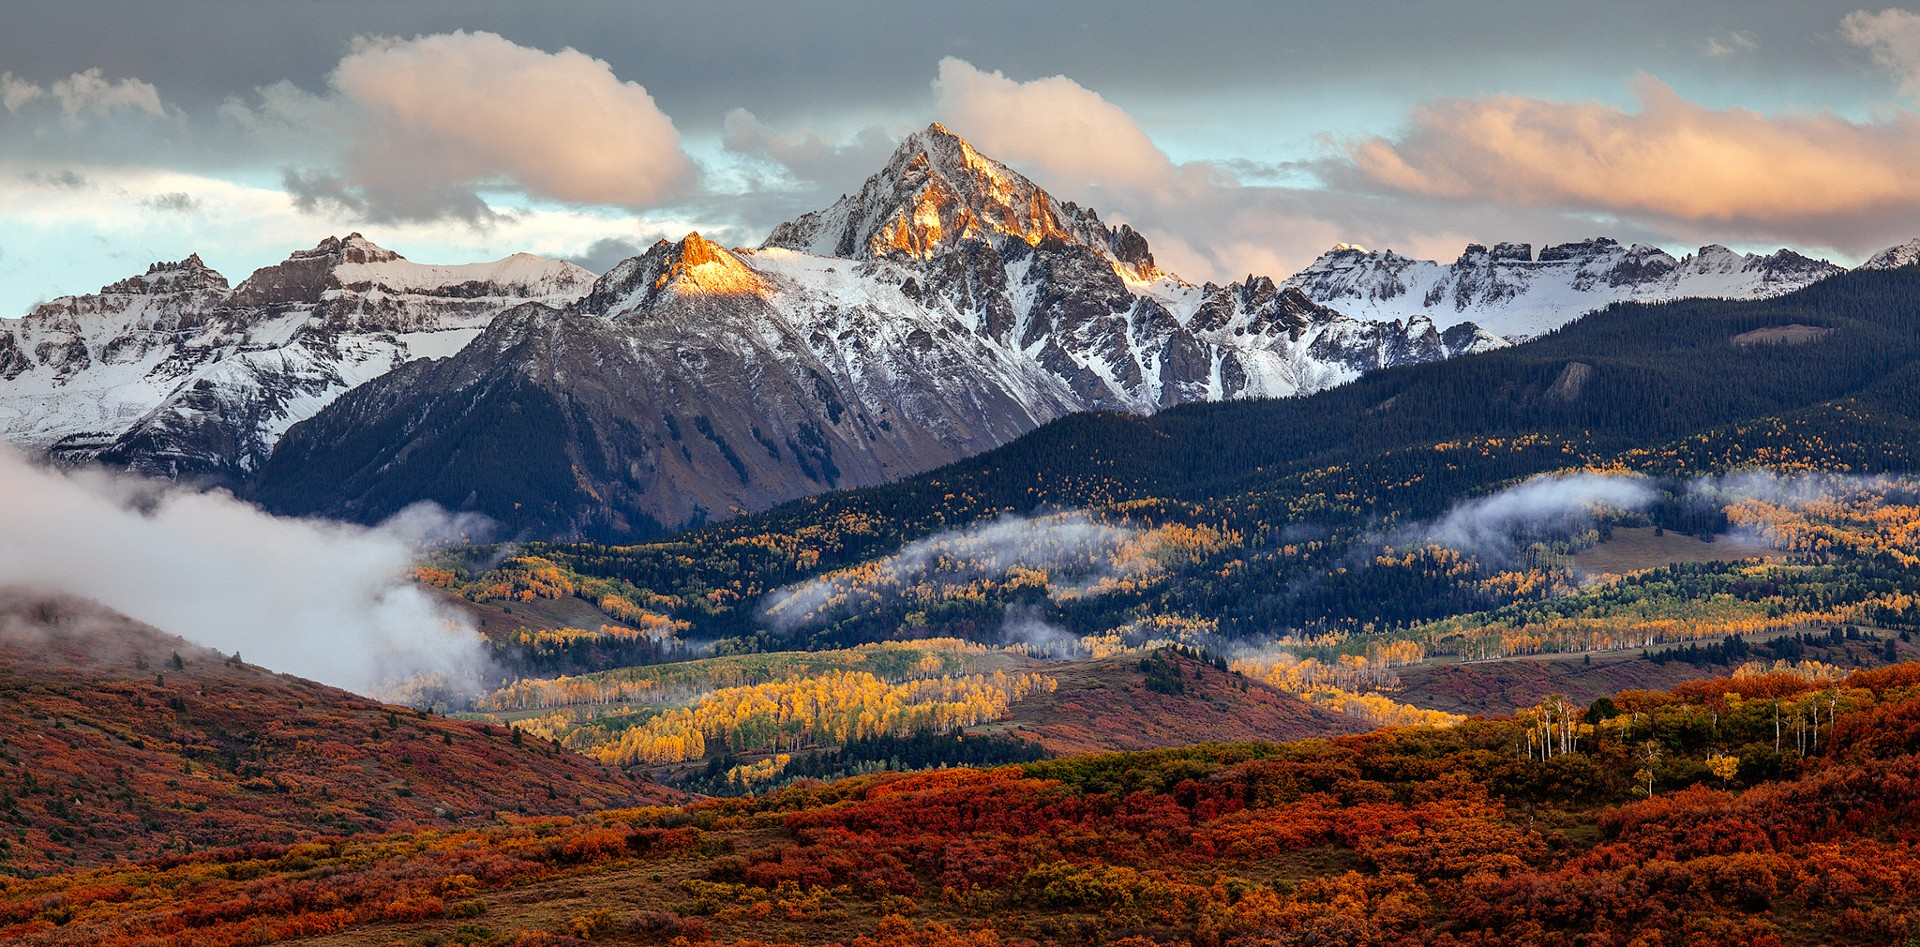 Colorado mountains hd nature 4k wallpapers images - Colorado wallpaper ...